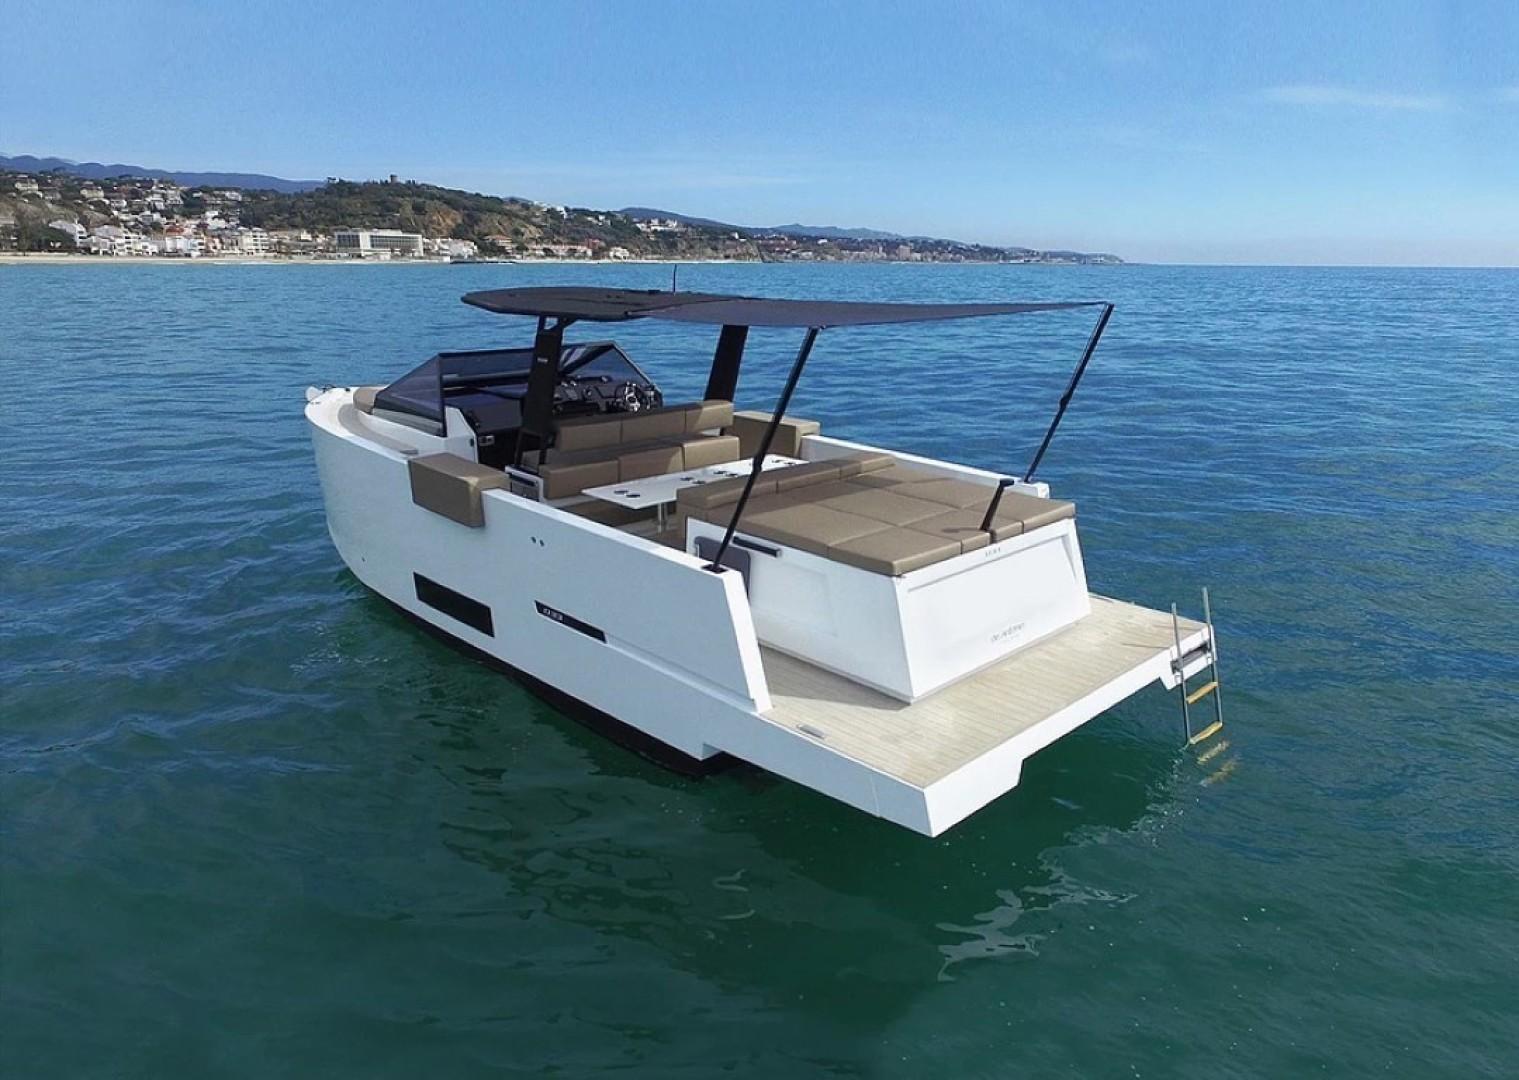 De Antonio-D34 Cruiser 2020-De Antonio Yachts D34 Cruiser Fort Lauderdale-Florida-United States-De Antonio Yachts D34 Cruiser Fort Lauderdale (1)-1549269 | Thumbnail